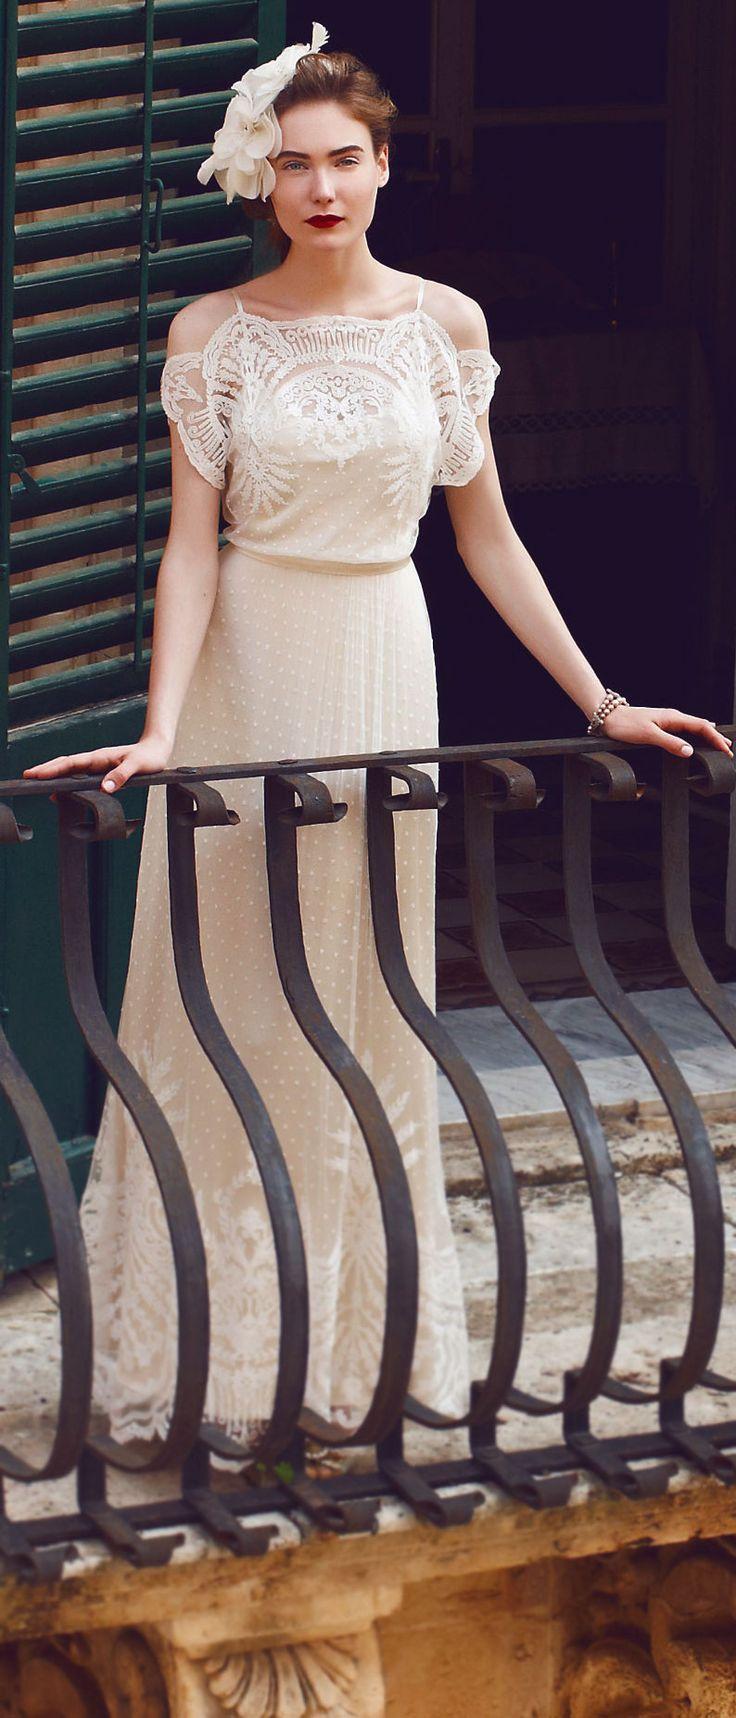 Gorgeous wedding gown - very Gatsby